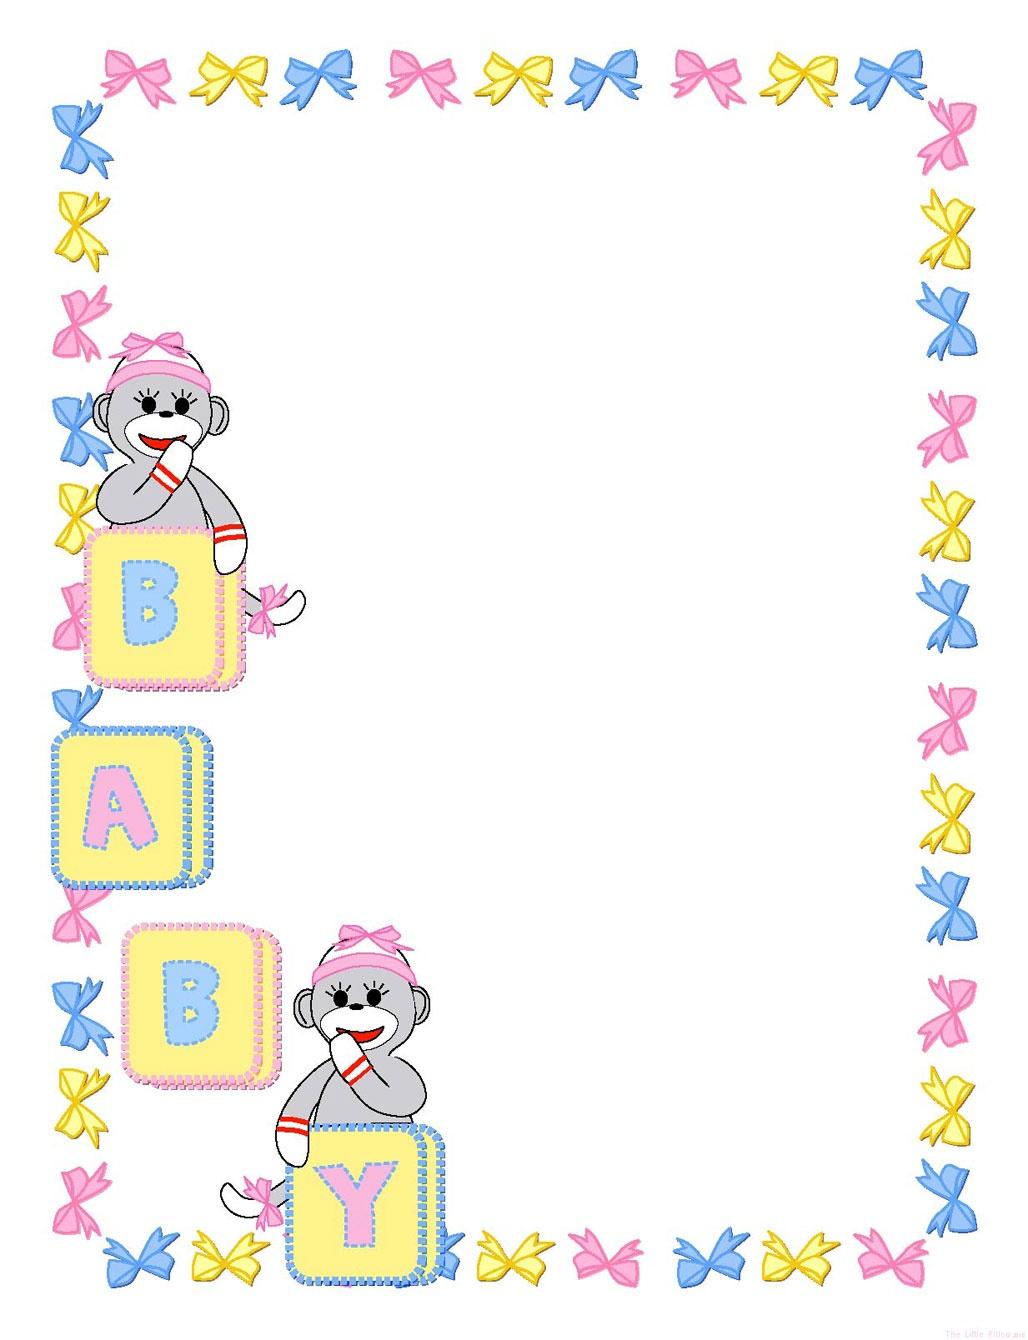 Free Printable, Digital, Scrapbook Template Pages, New Born, Baby - Baby Scrapbook Templates Free Printable